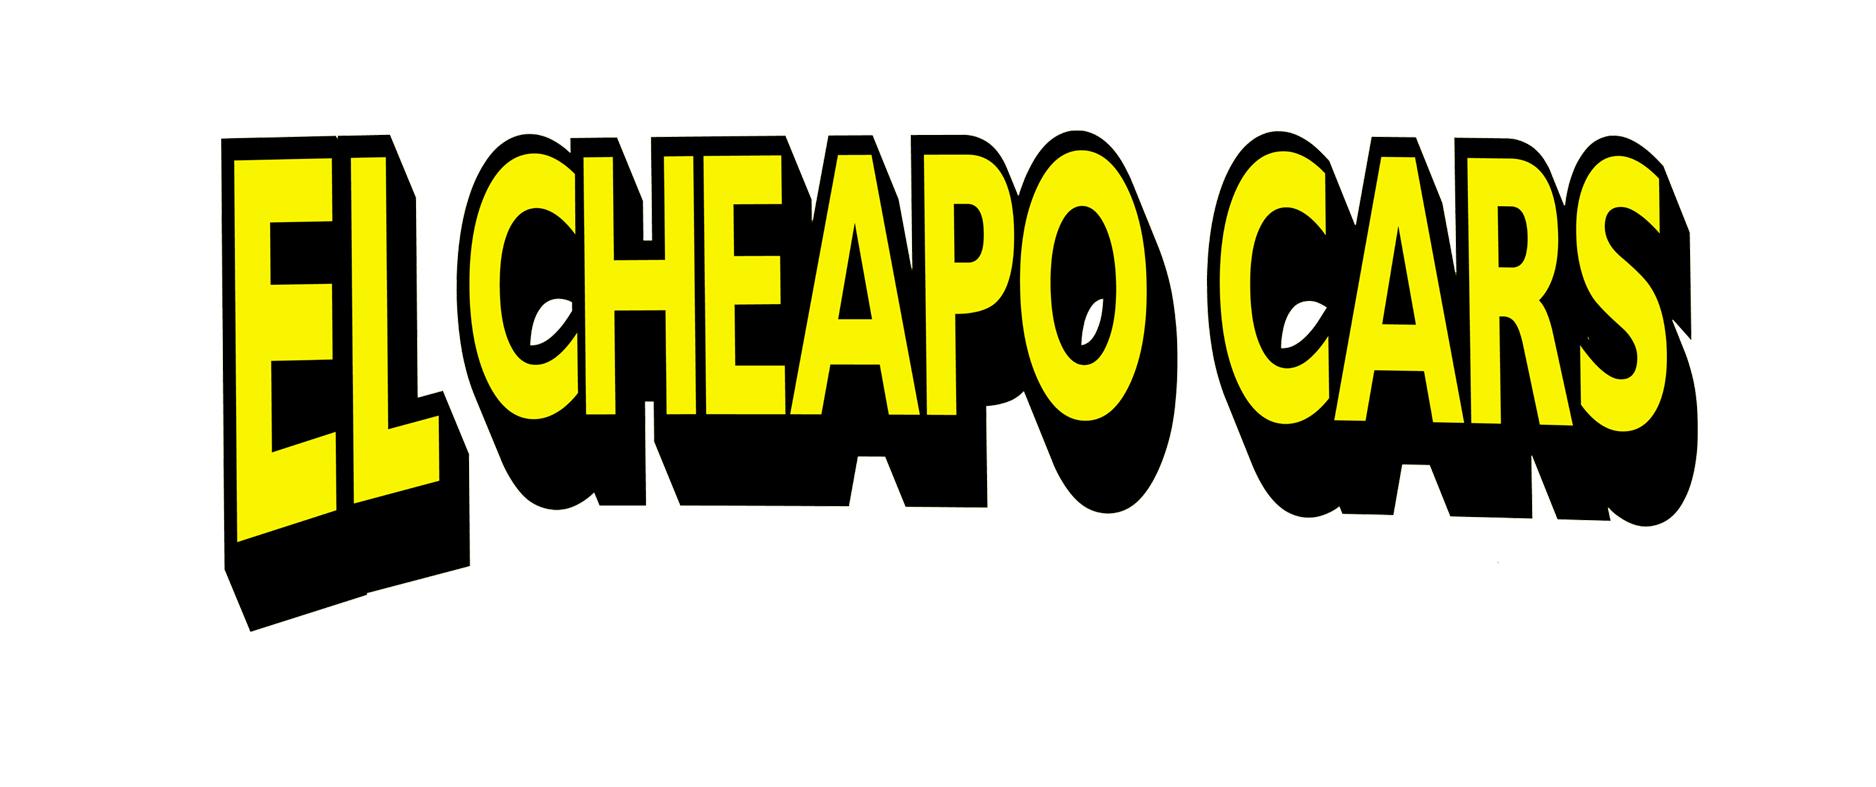 El Cheapo Cars Logo.jpg